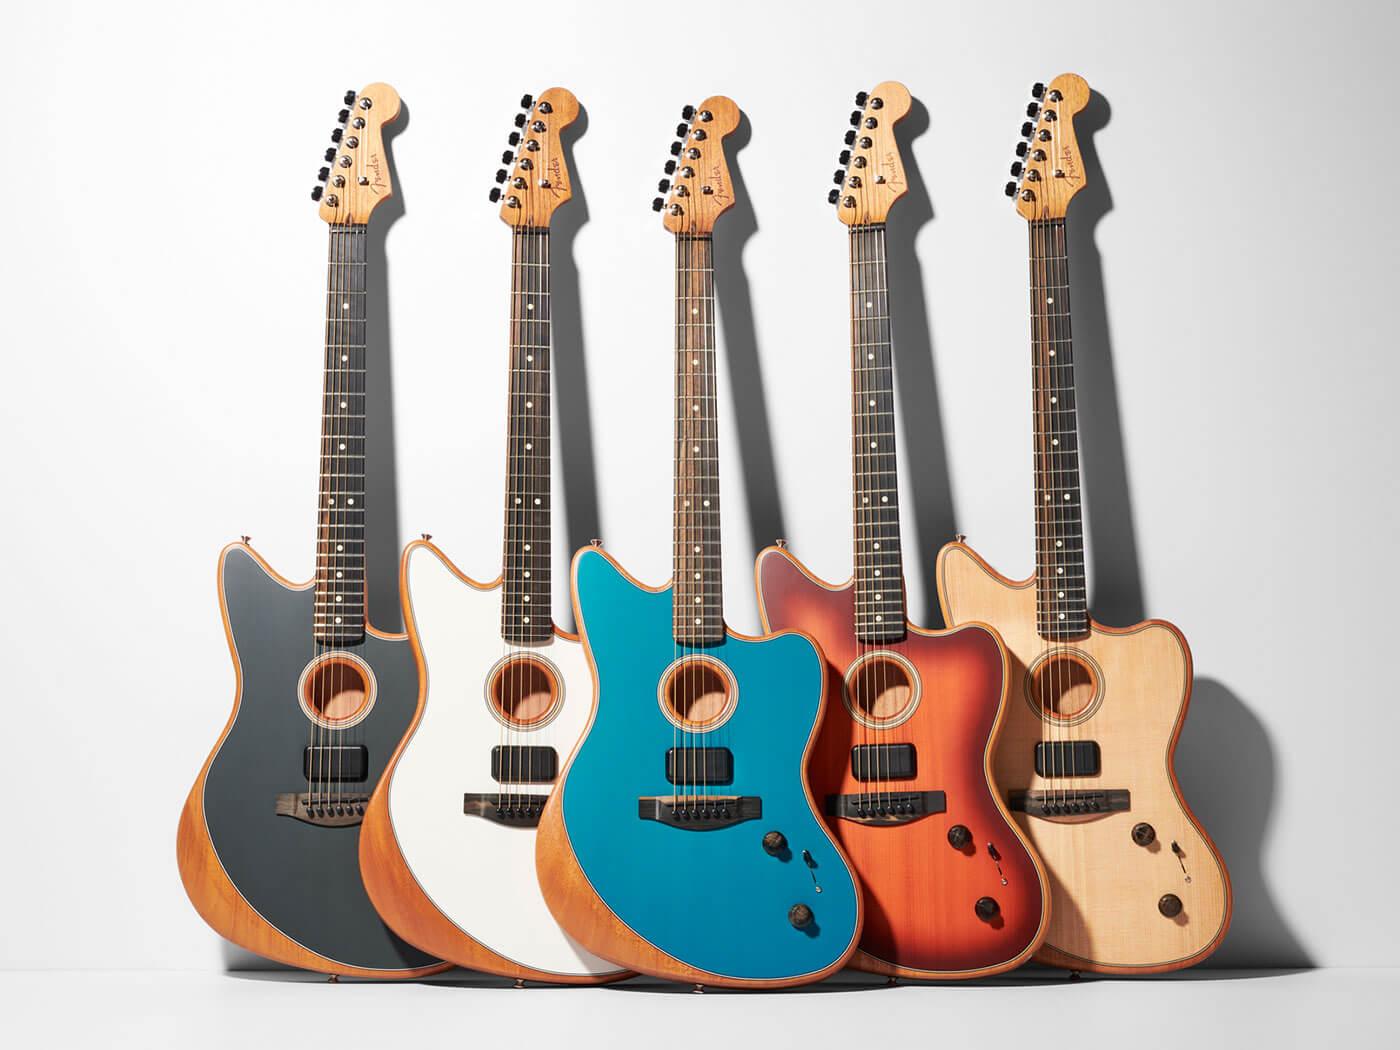 Fender Acoustasonic Jazzmaster